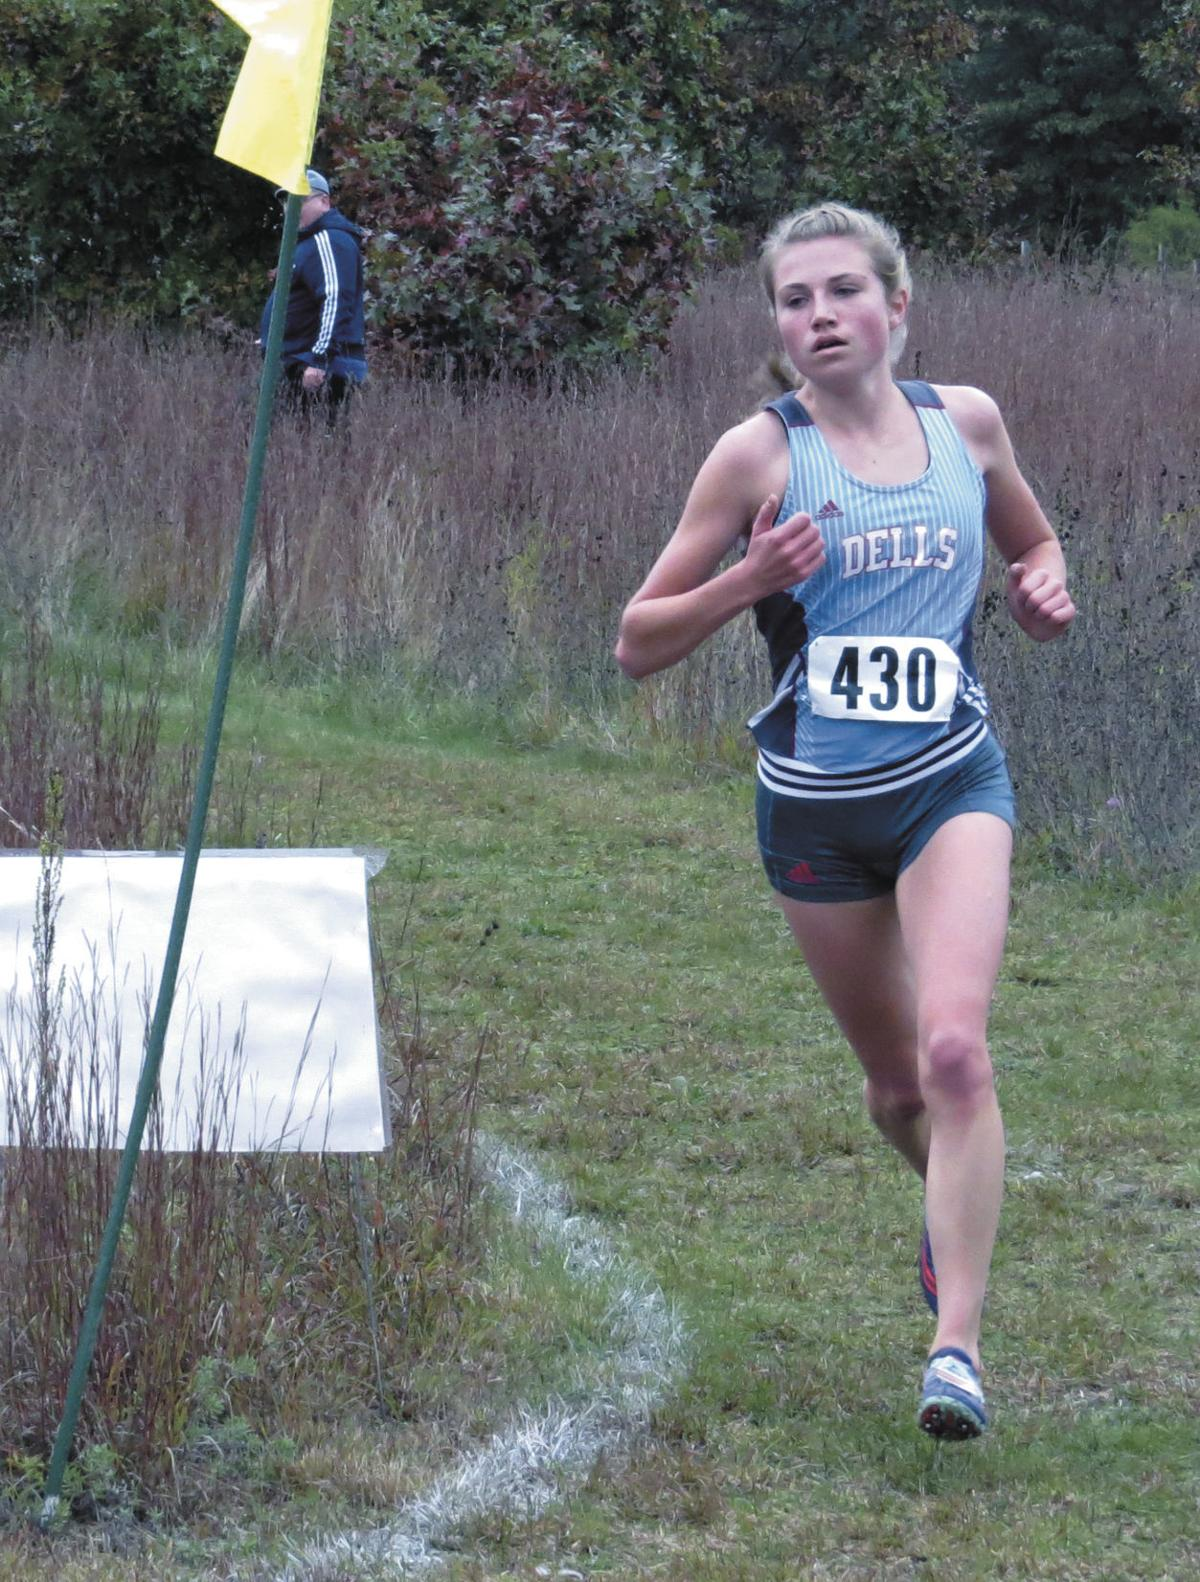 Prep girls cross country photo: Wisconsin Dells' Laura Beghin